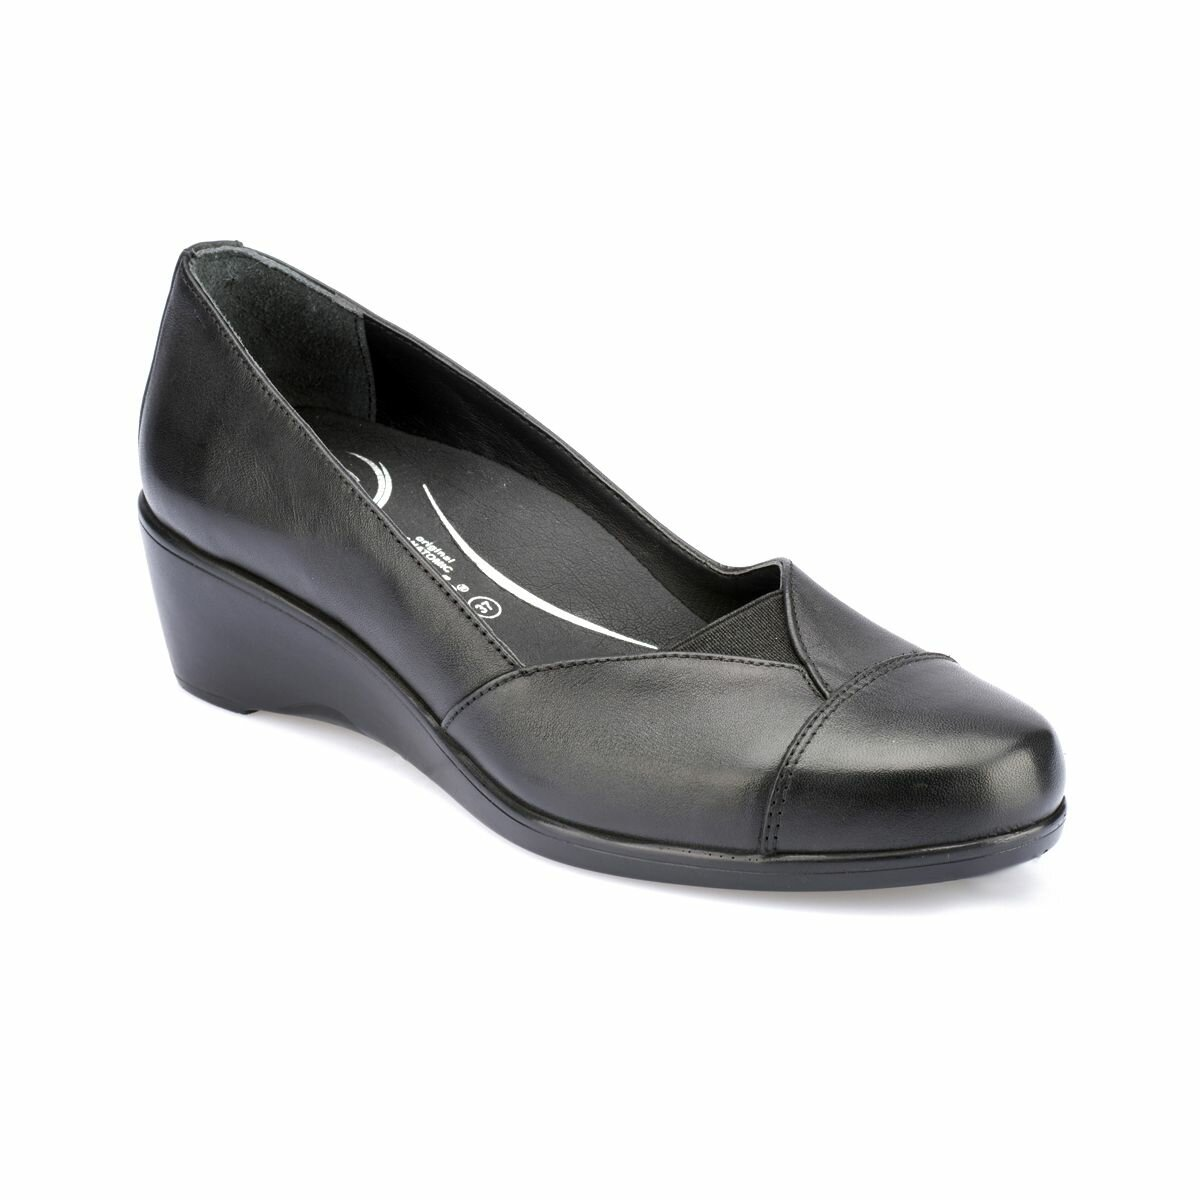 FLO 82.100142CZ Black Women Shoes Polaris 5 Point